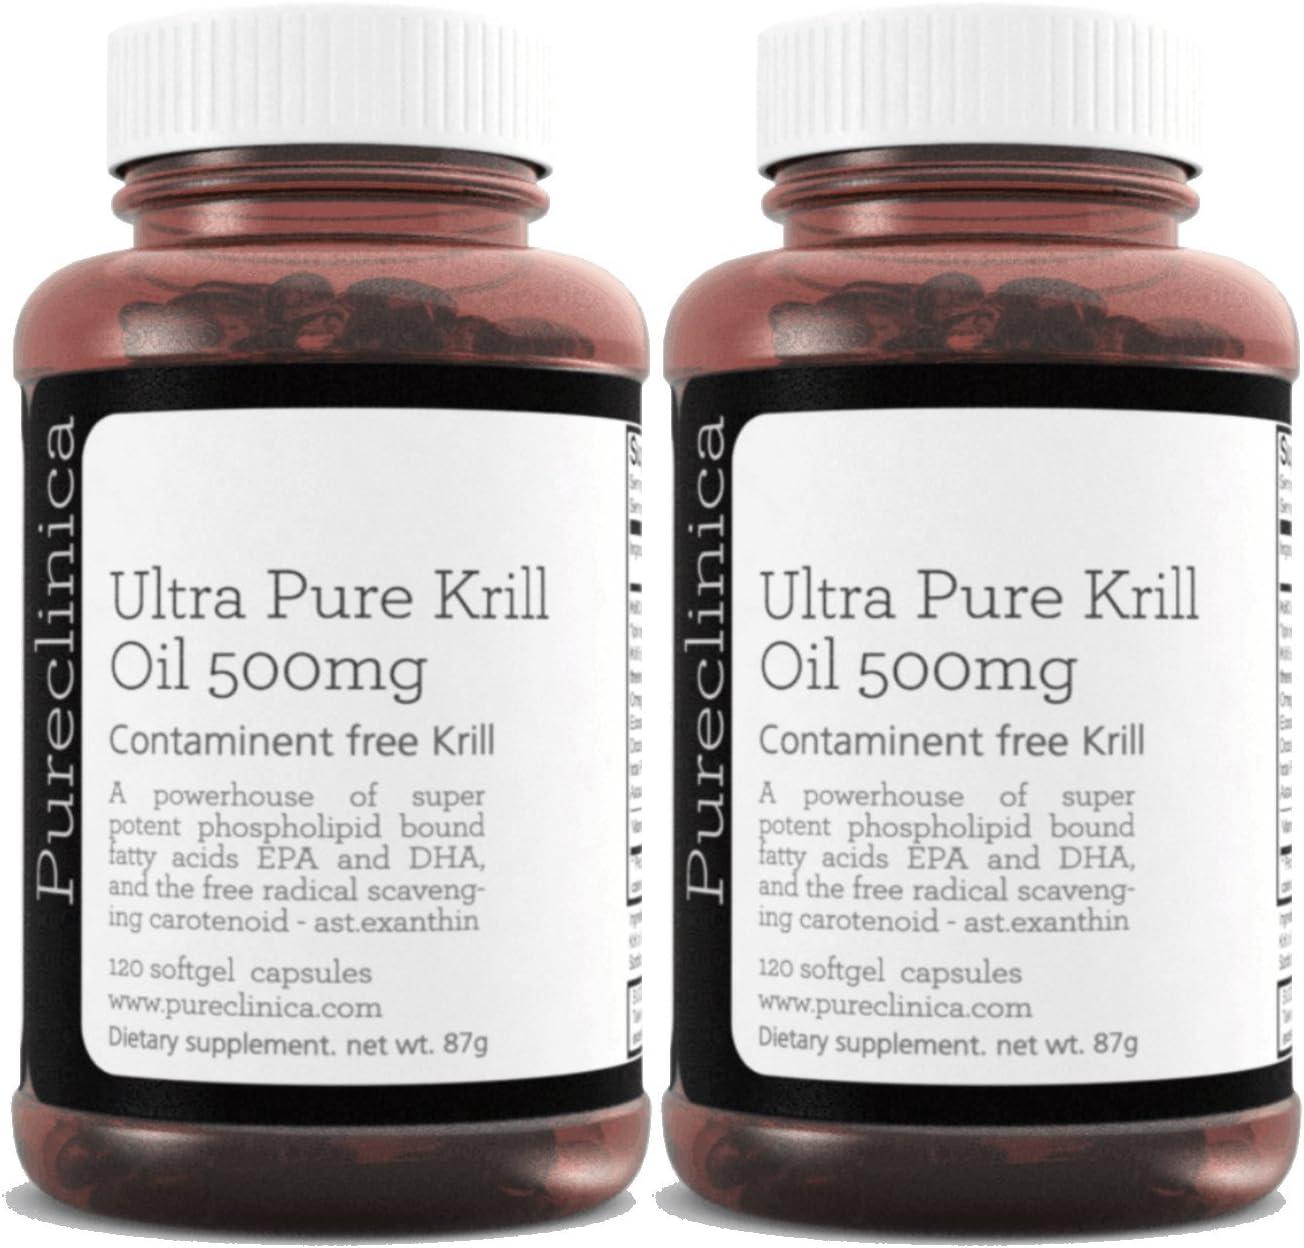 Aceite de Kril Aker Ultra Puro 500mg x 240 cápsulas (2 frascos) - de las limpias aguas del Antártico que dan un rico suministro de Astaxantina, Omega 3, y Vitamina D. SKU: KRI500